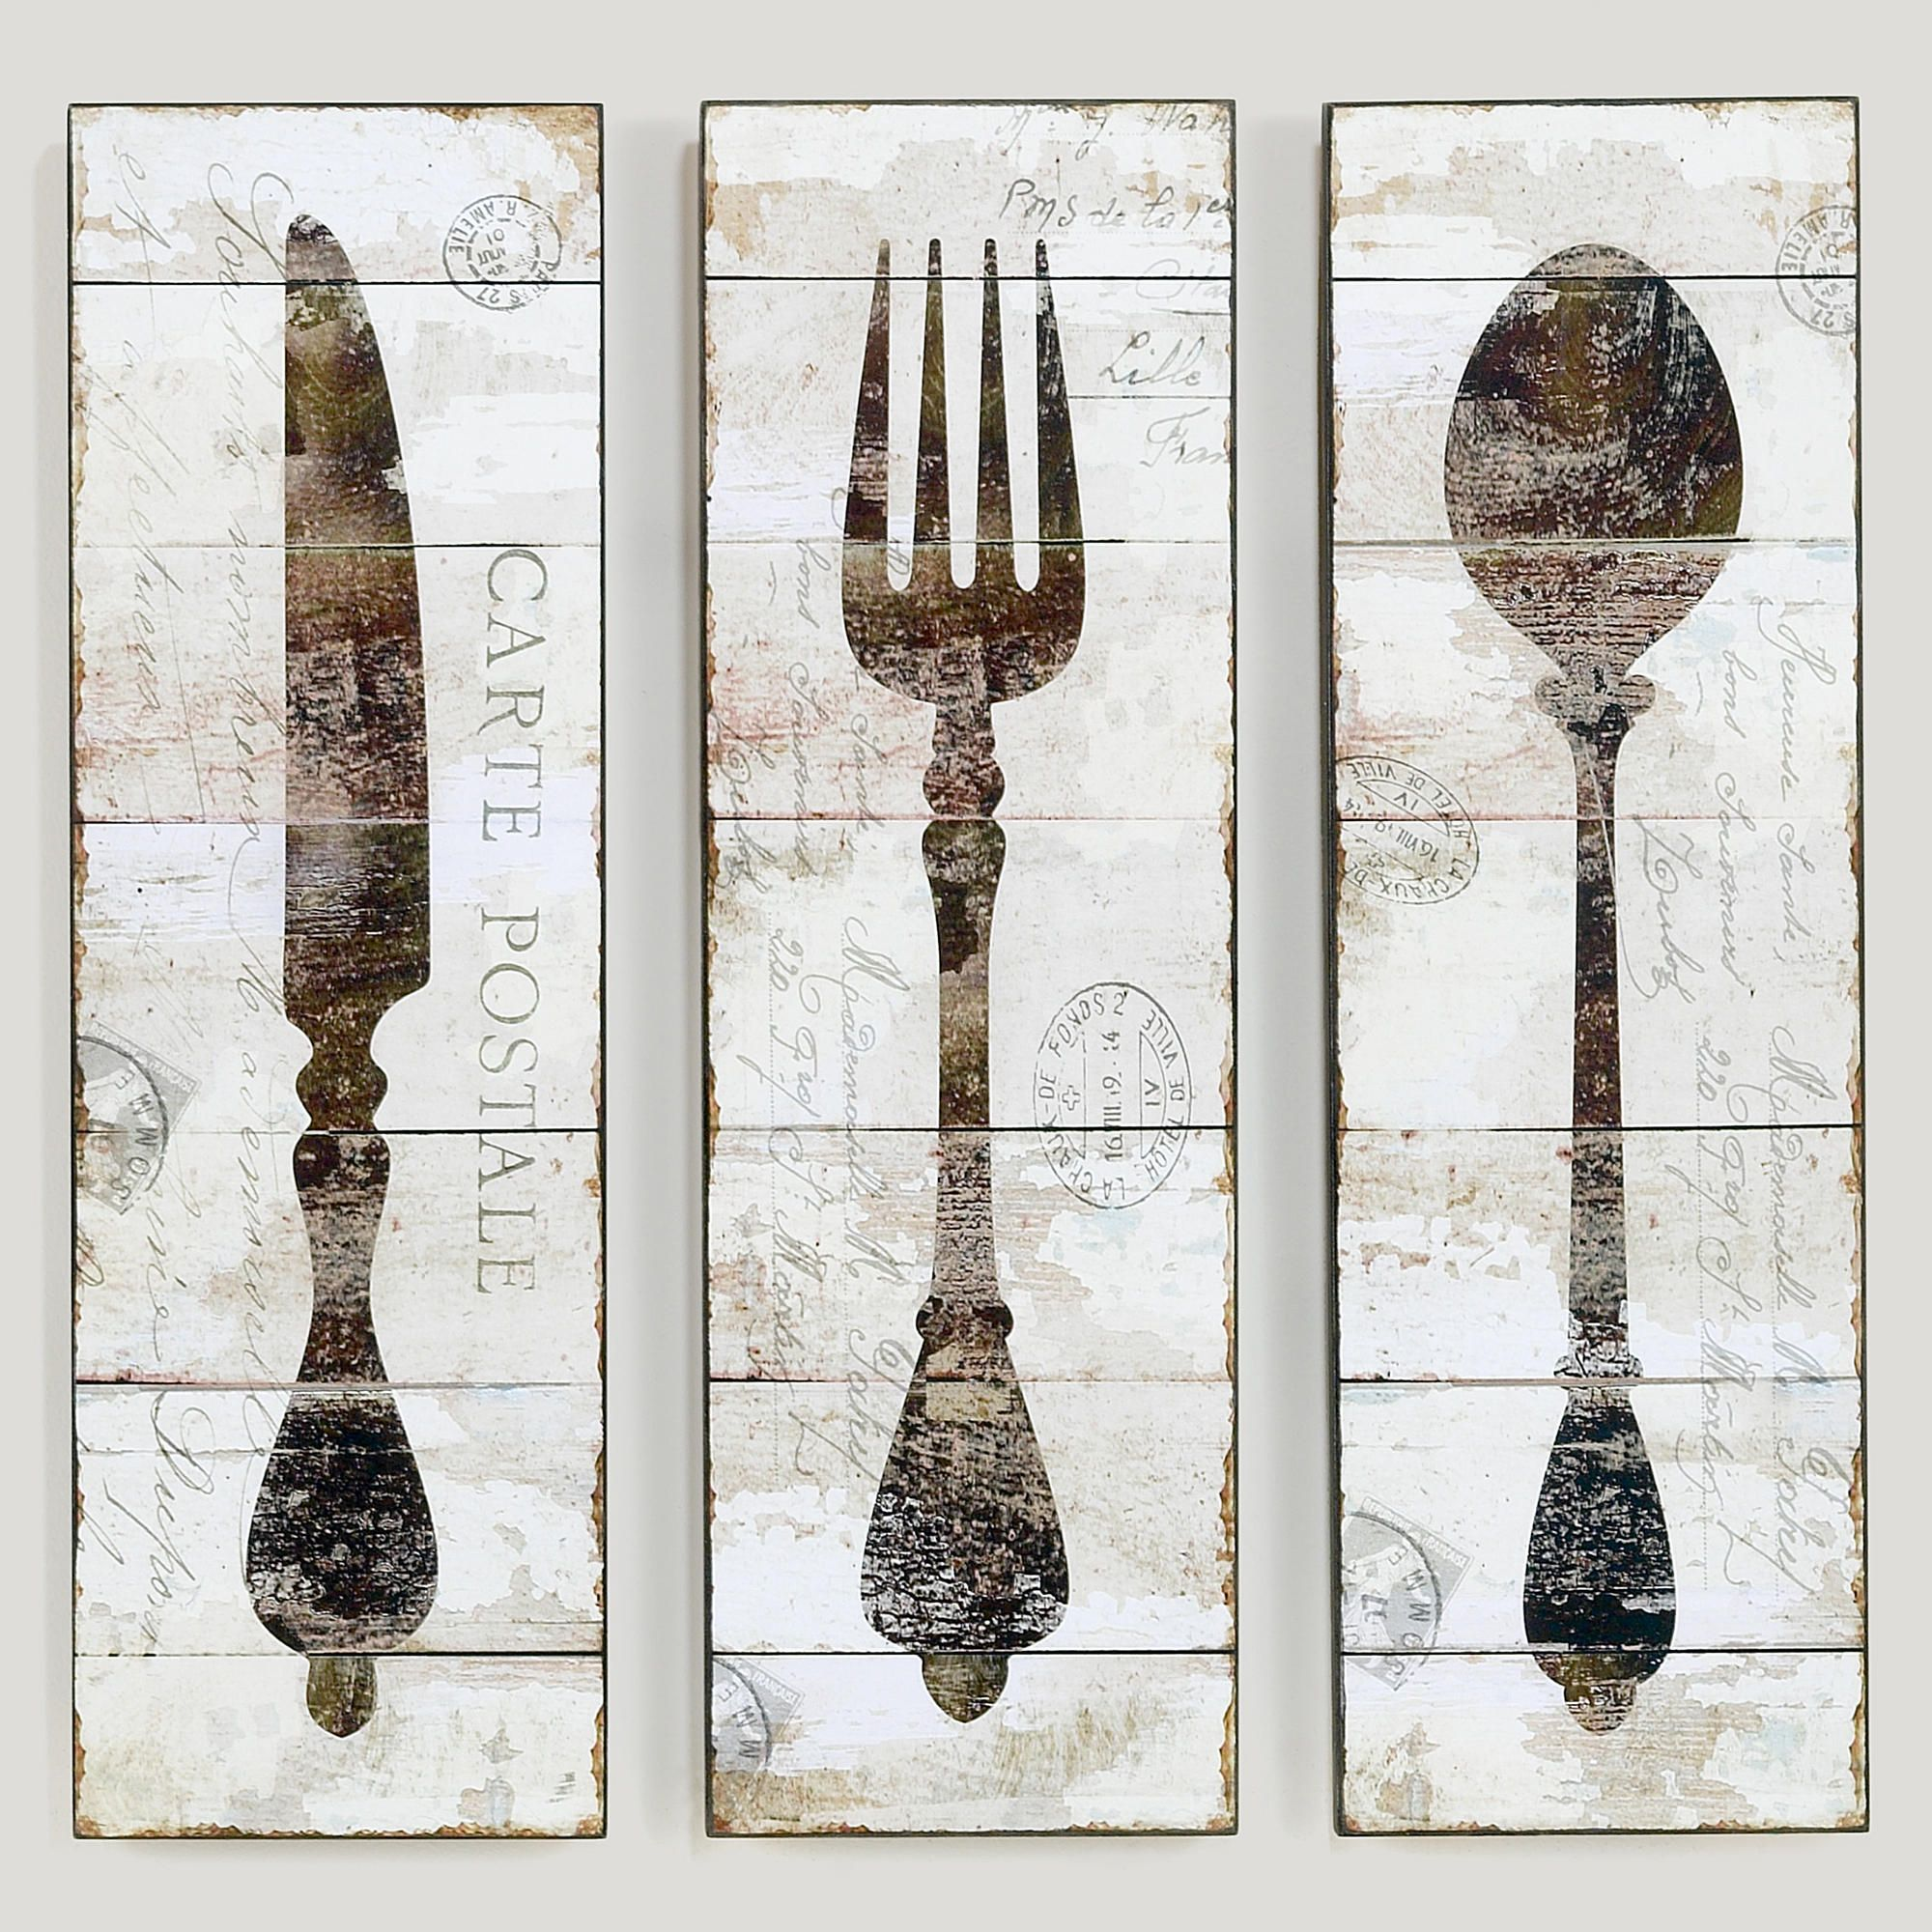 Natalie Wood Panel Wall Art Fork